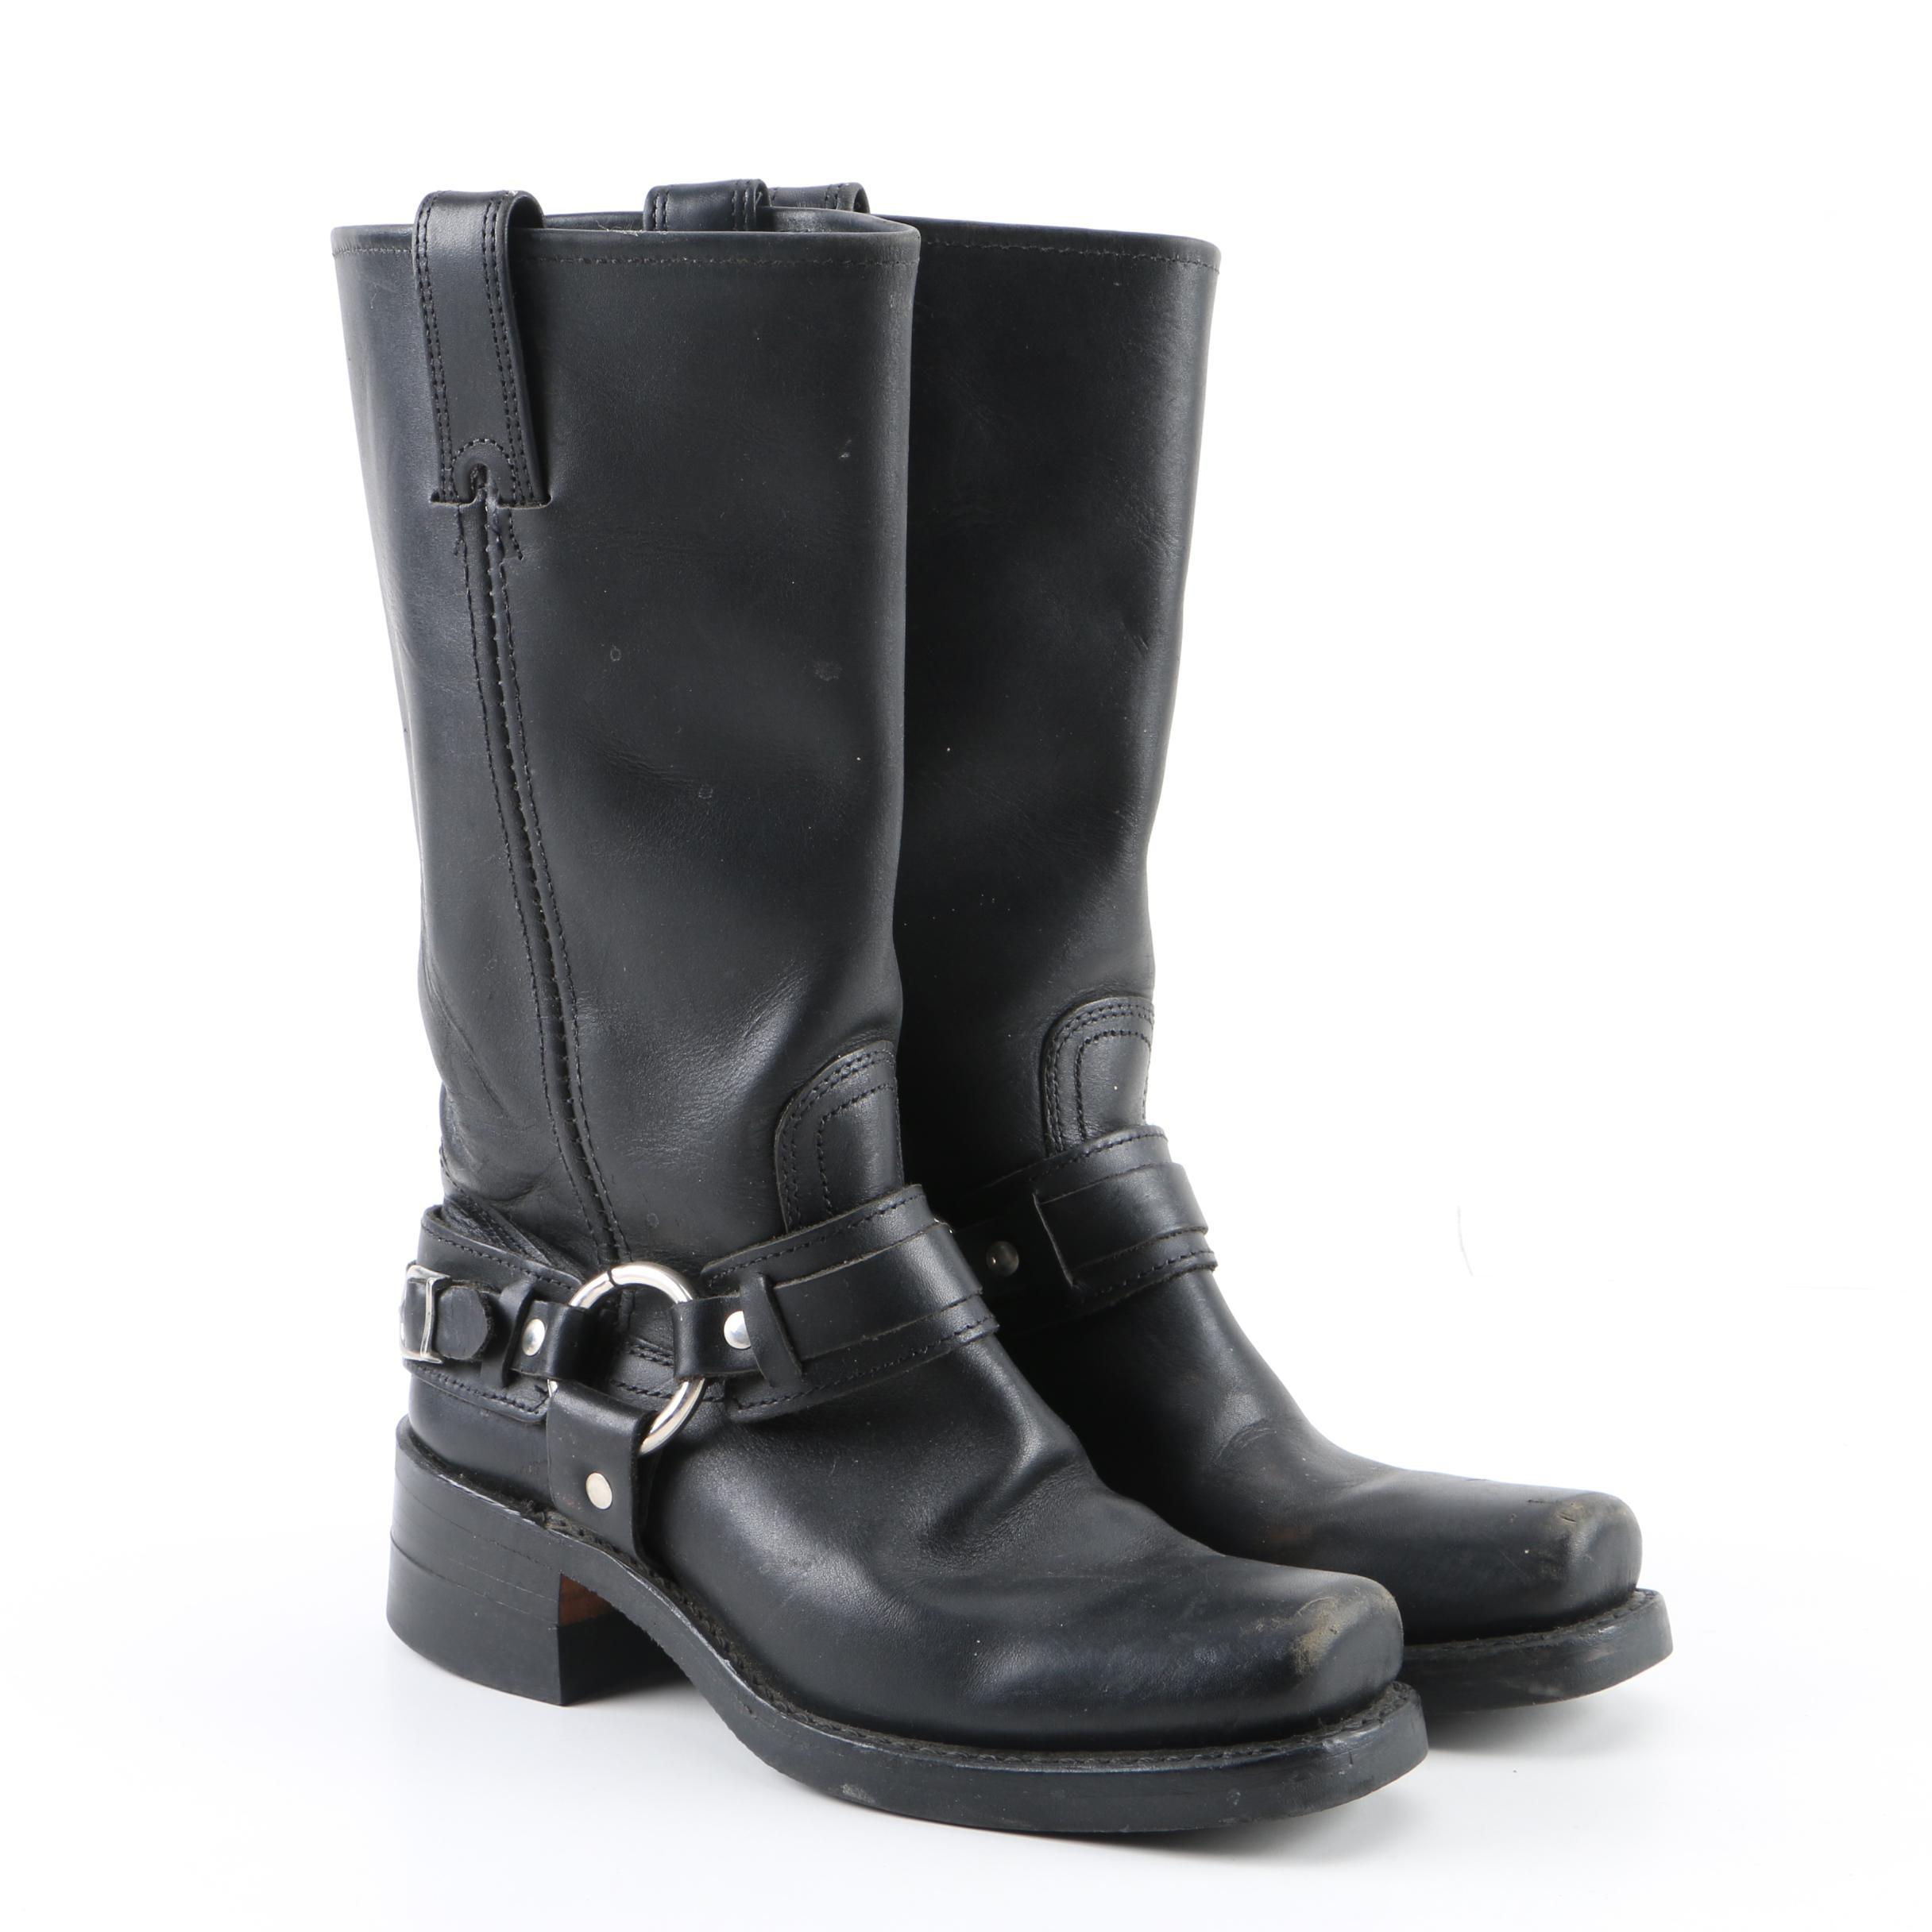 Women's Frye Black Leather Harness Boots